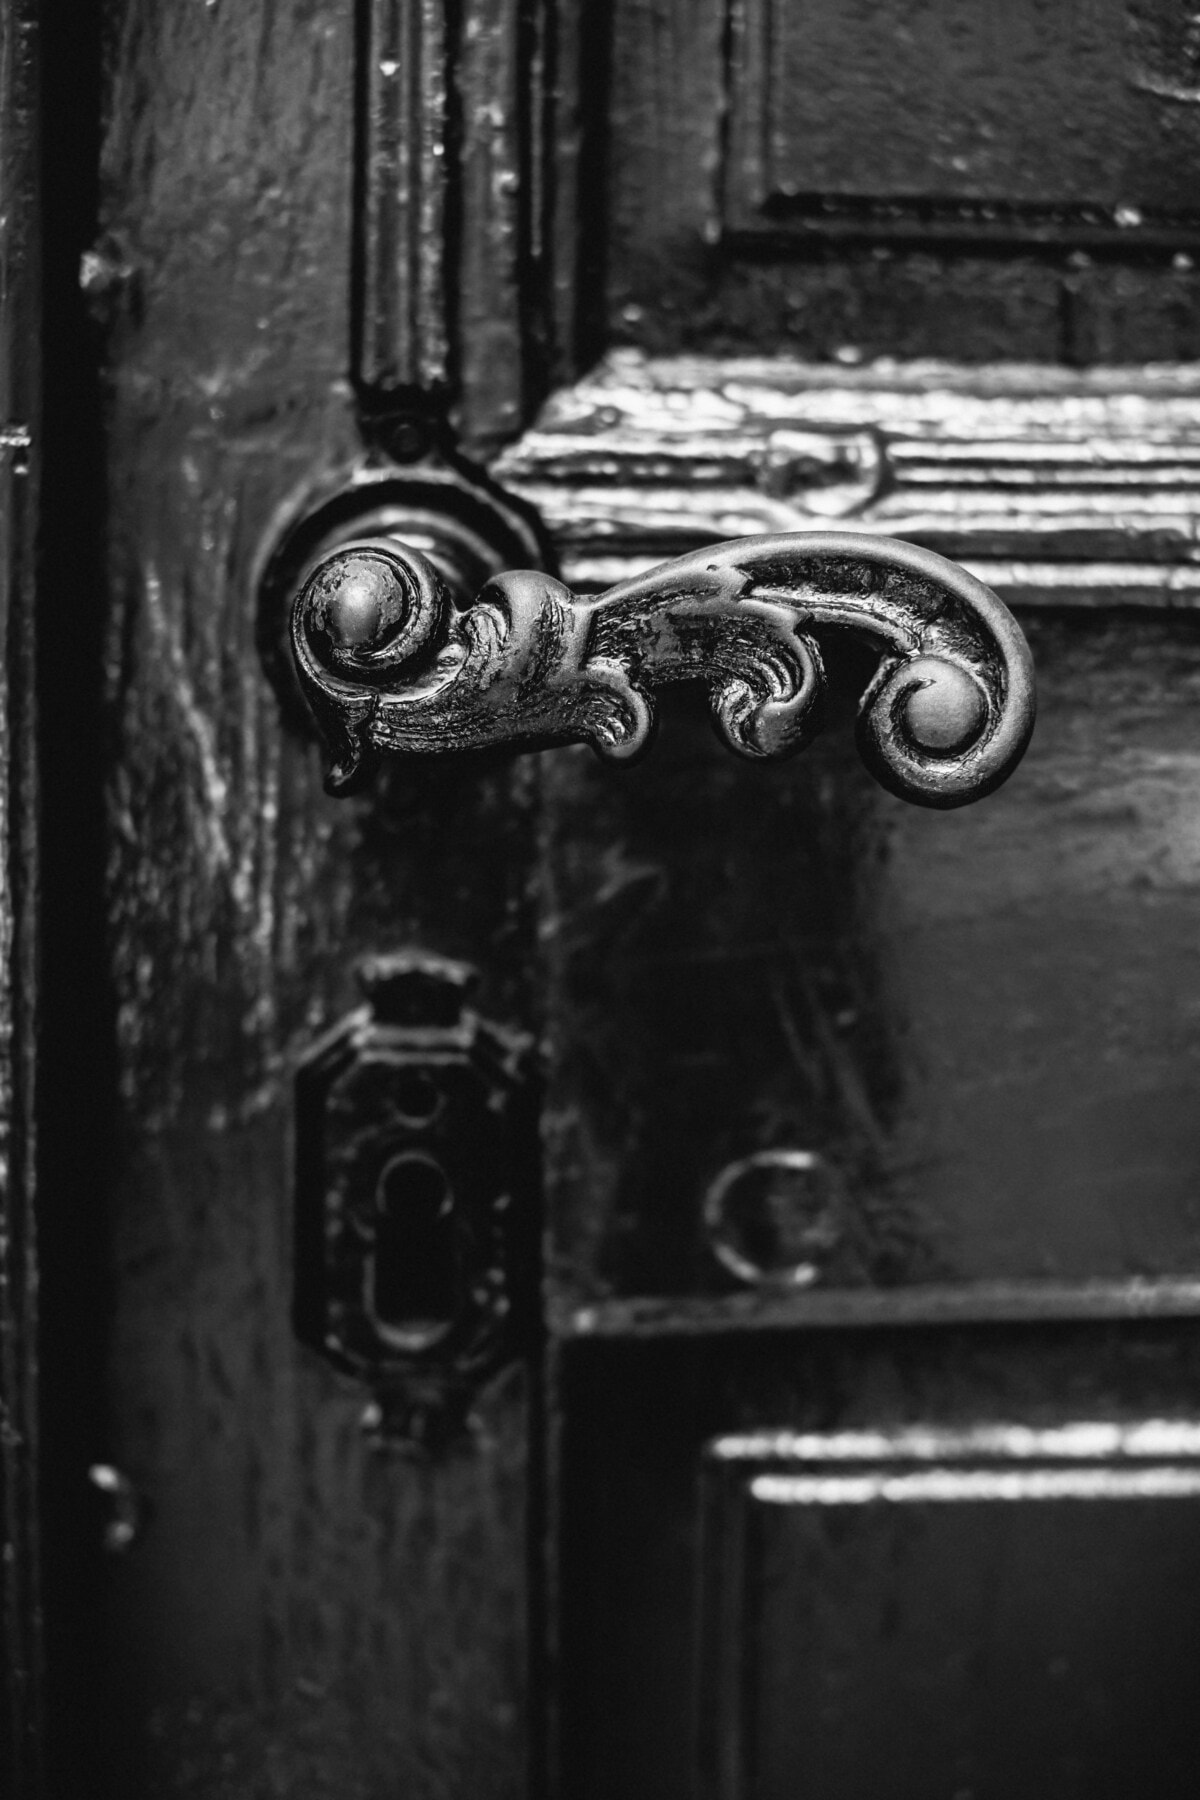 close-up, cast iron, black and white, front door, metal, lock, device, old, door, latch